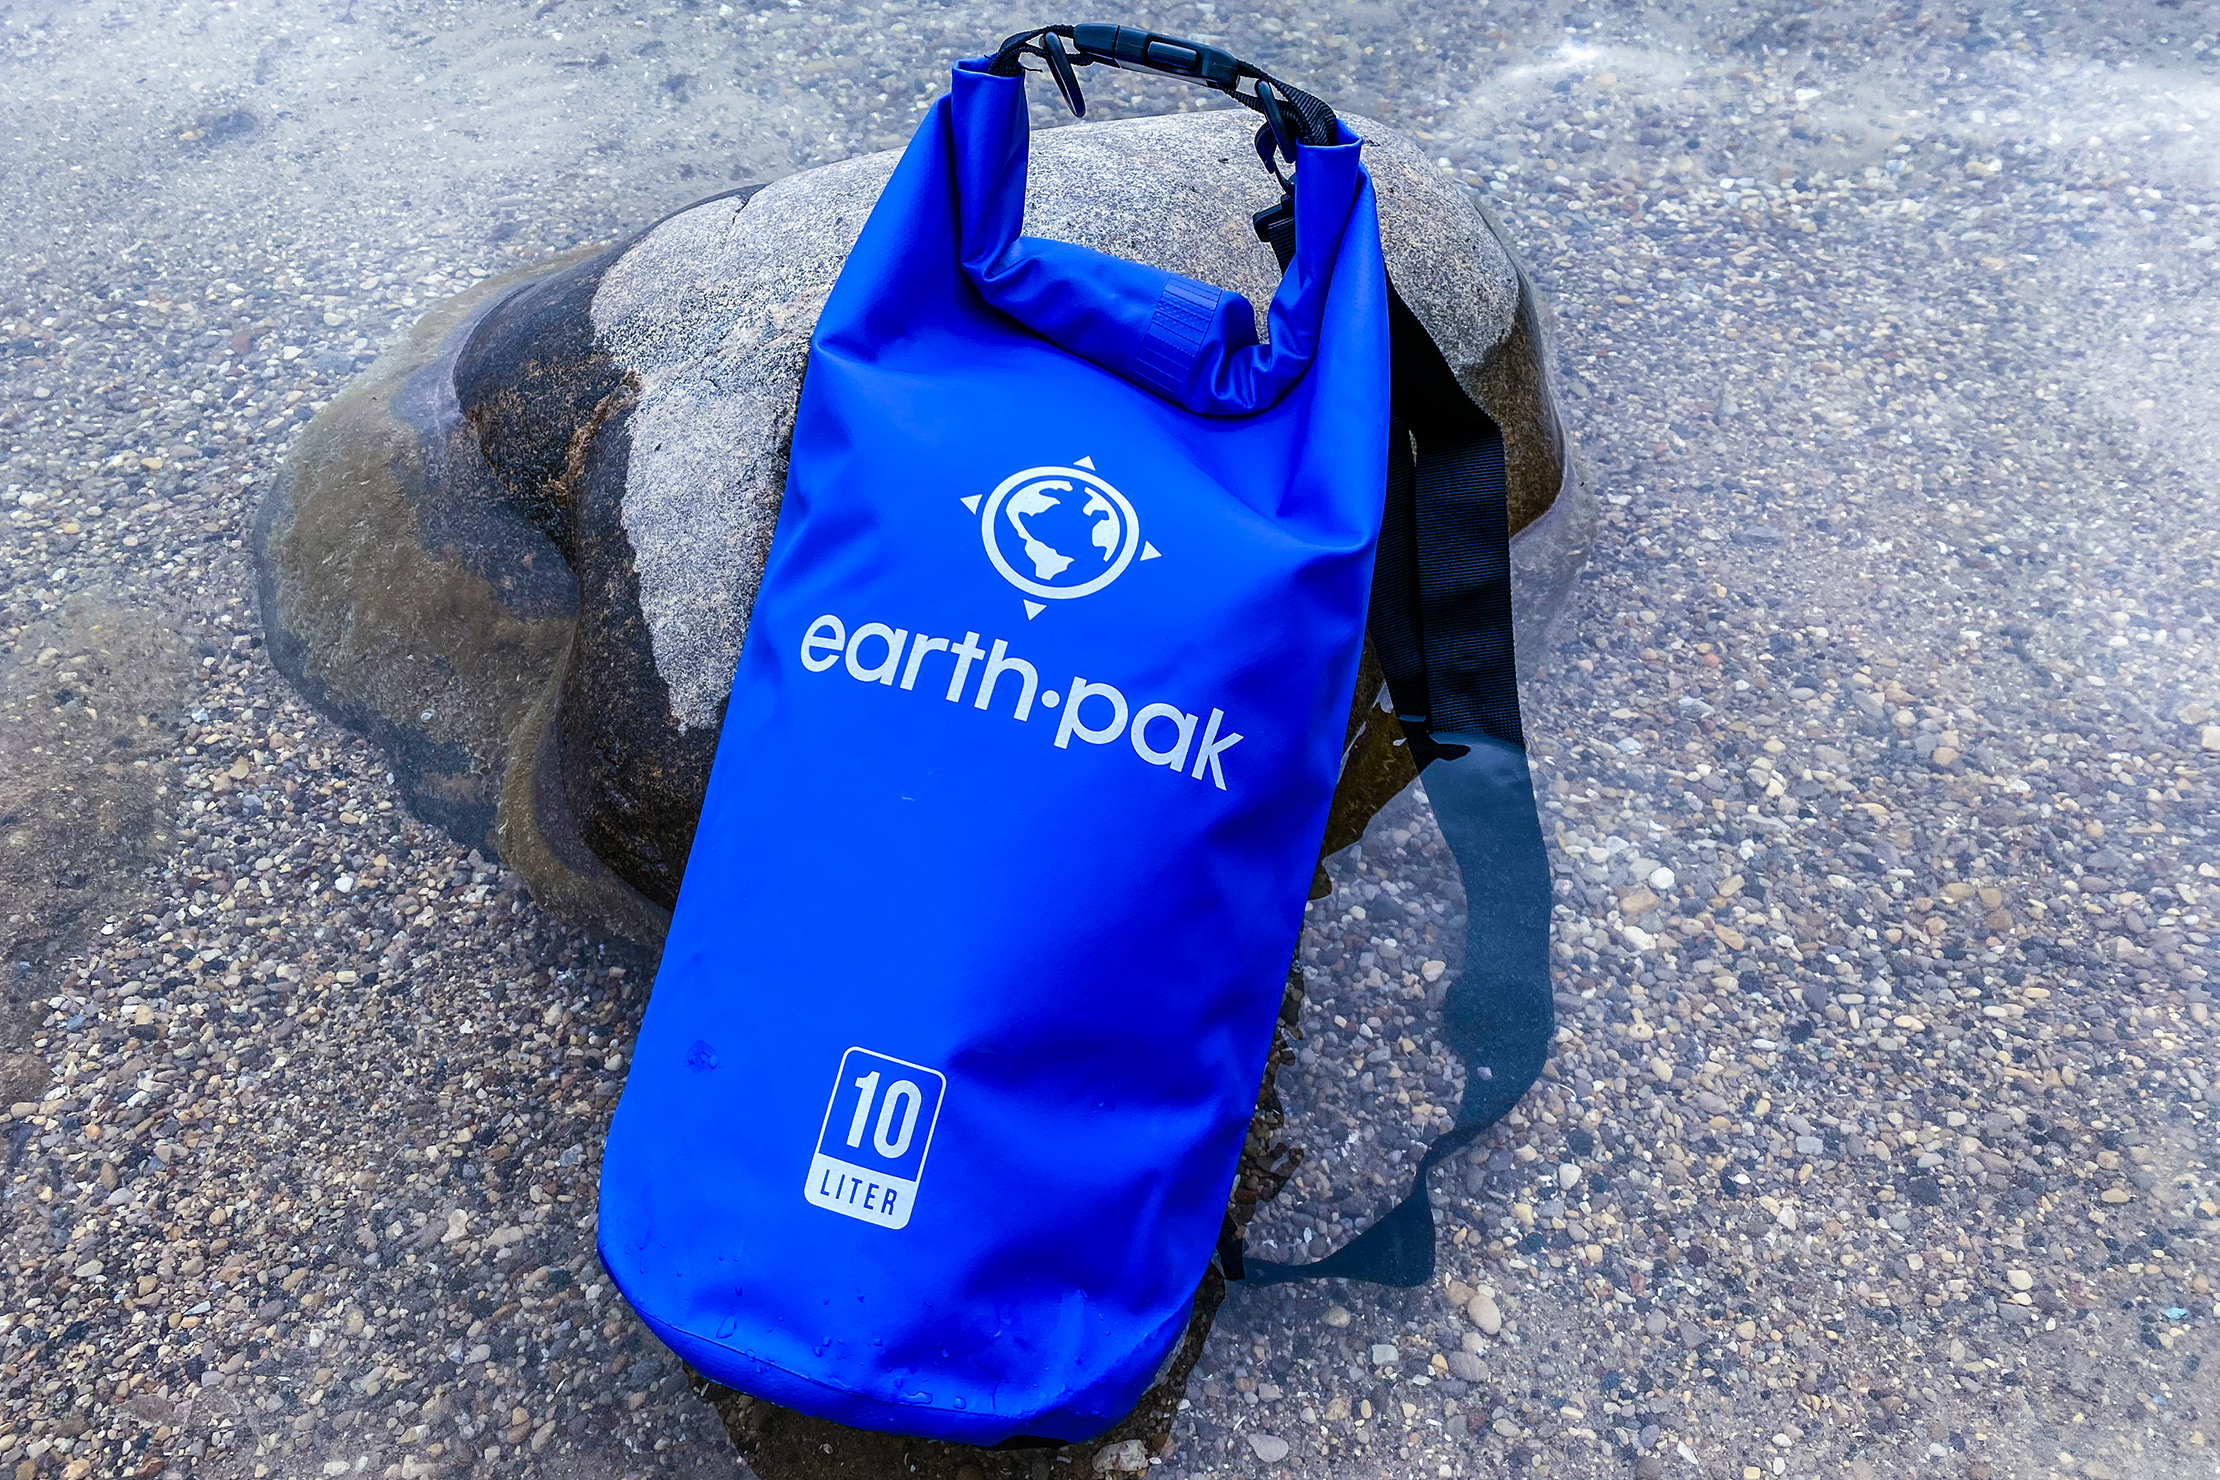 Earth Pak Original Waterproof Dry Bag In The Water